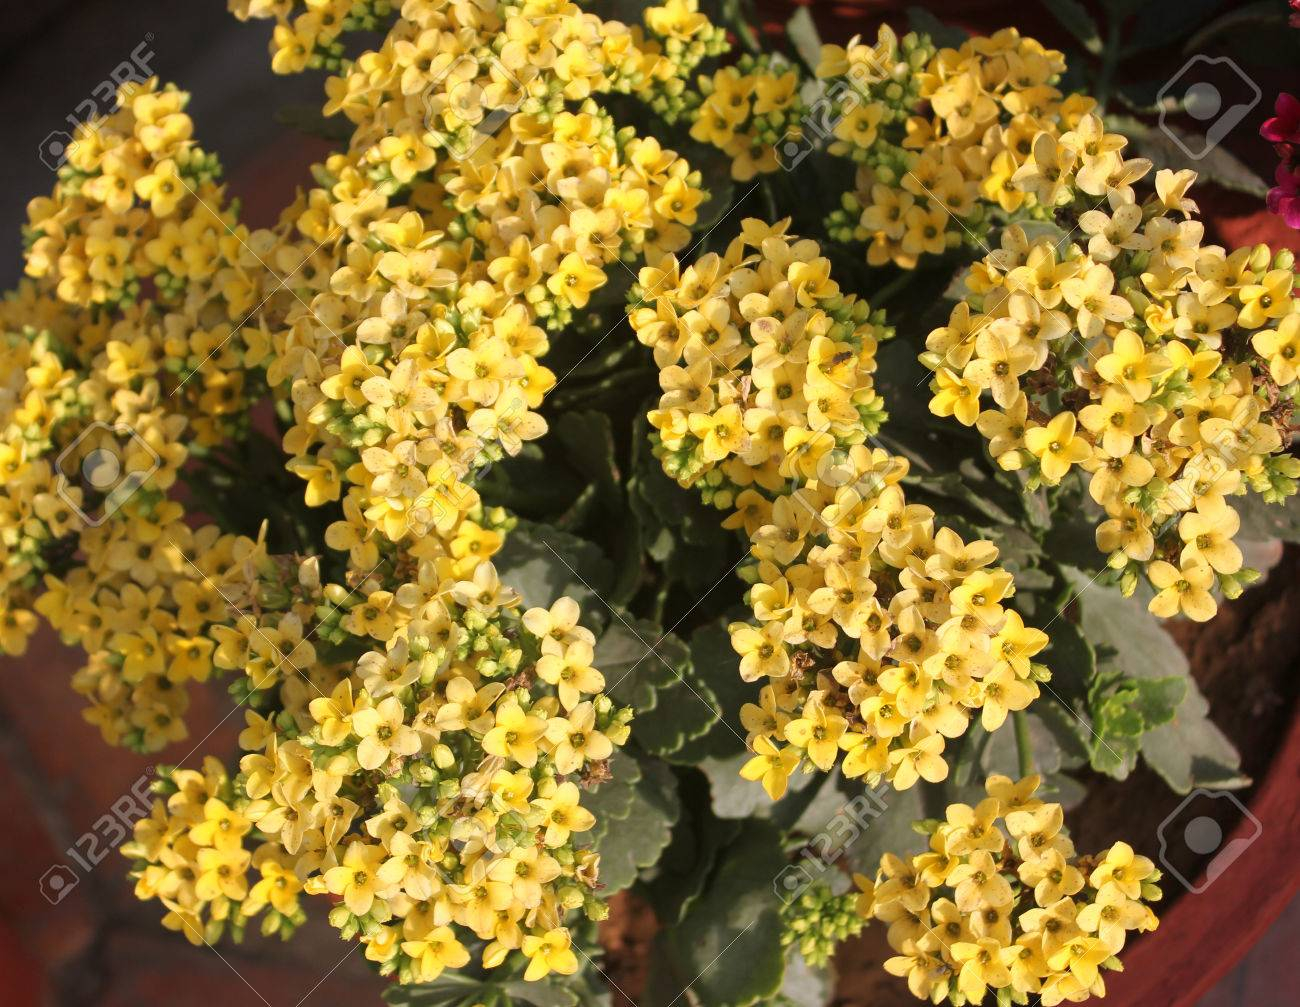 Kalanchoe Blossfeldiana Yellow Ornamental Potted Plant With Stock